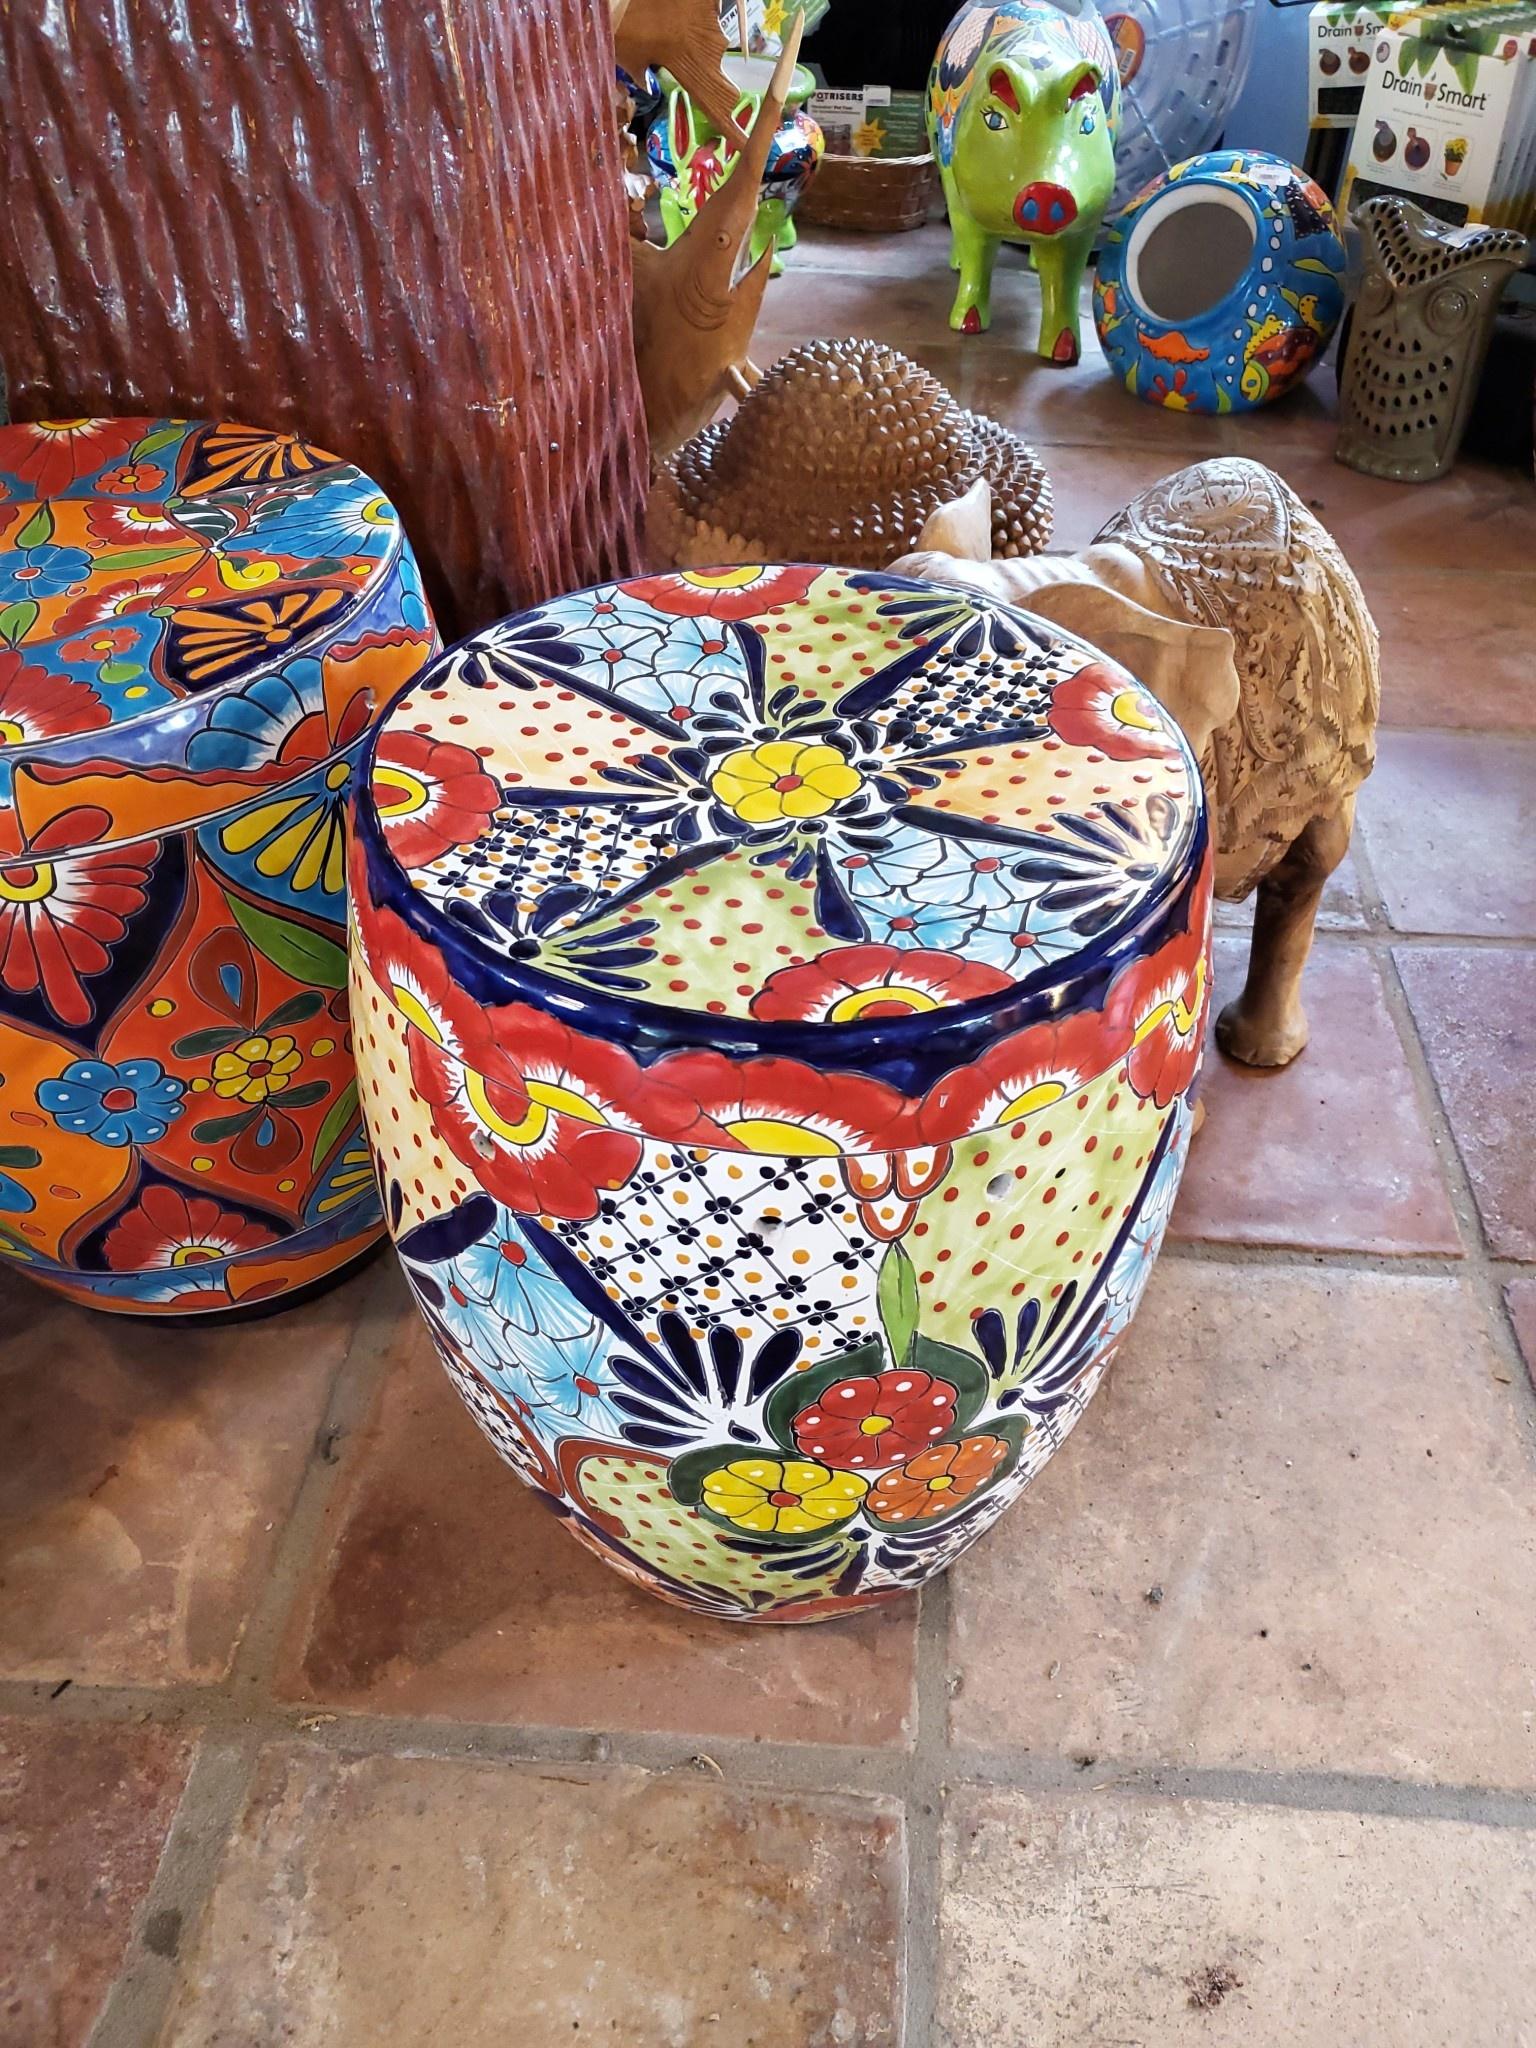 Phenomenal Talavera Stool Machost Co Dining Chair Design Ideas Machostcouk